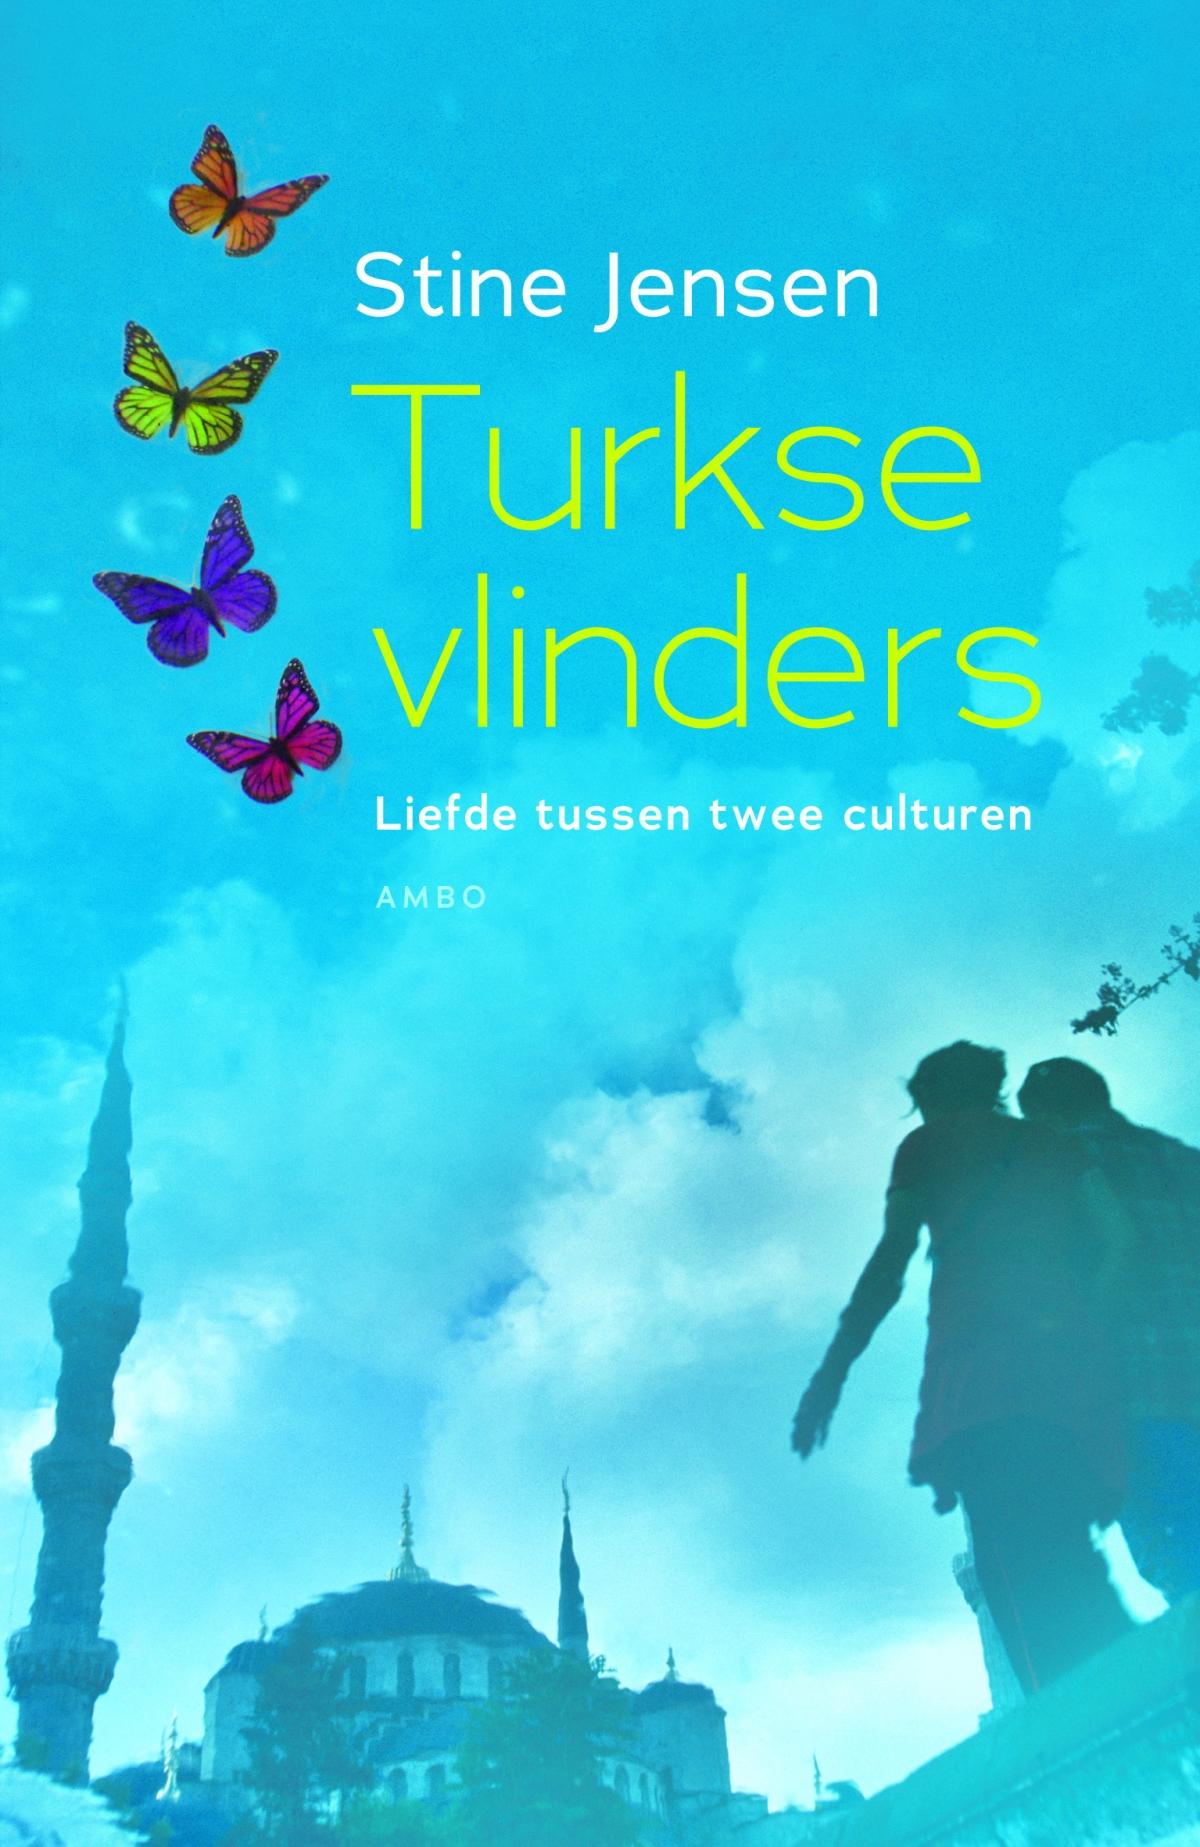 Turkse vlinders - Stine Jensen